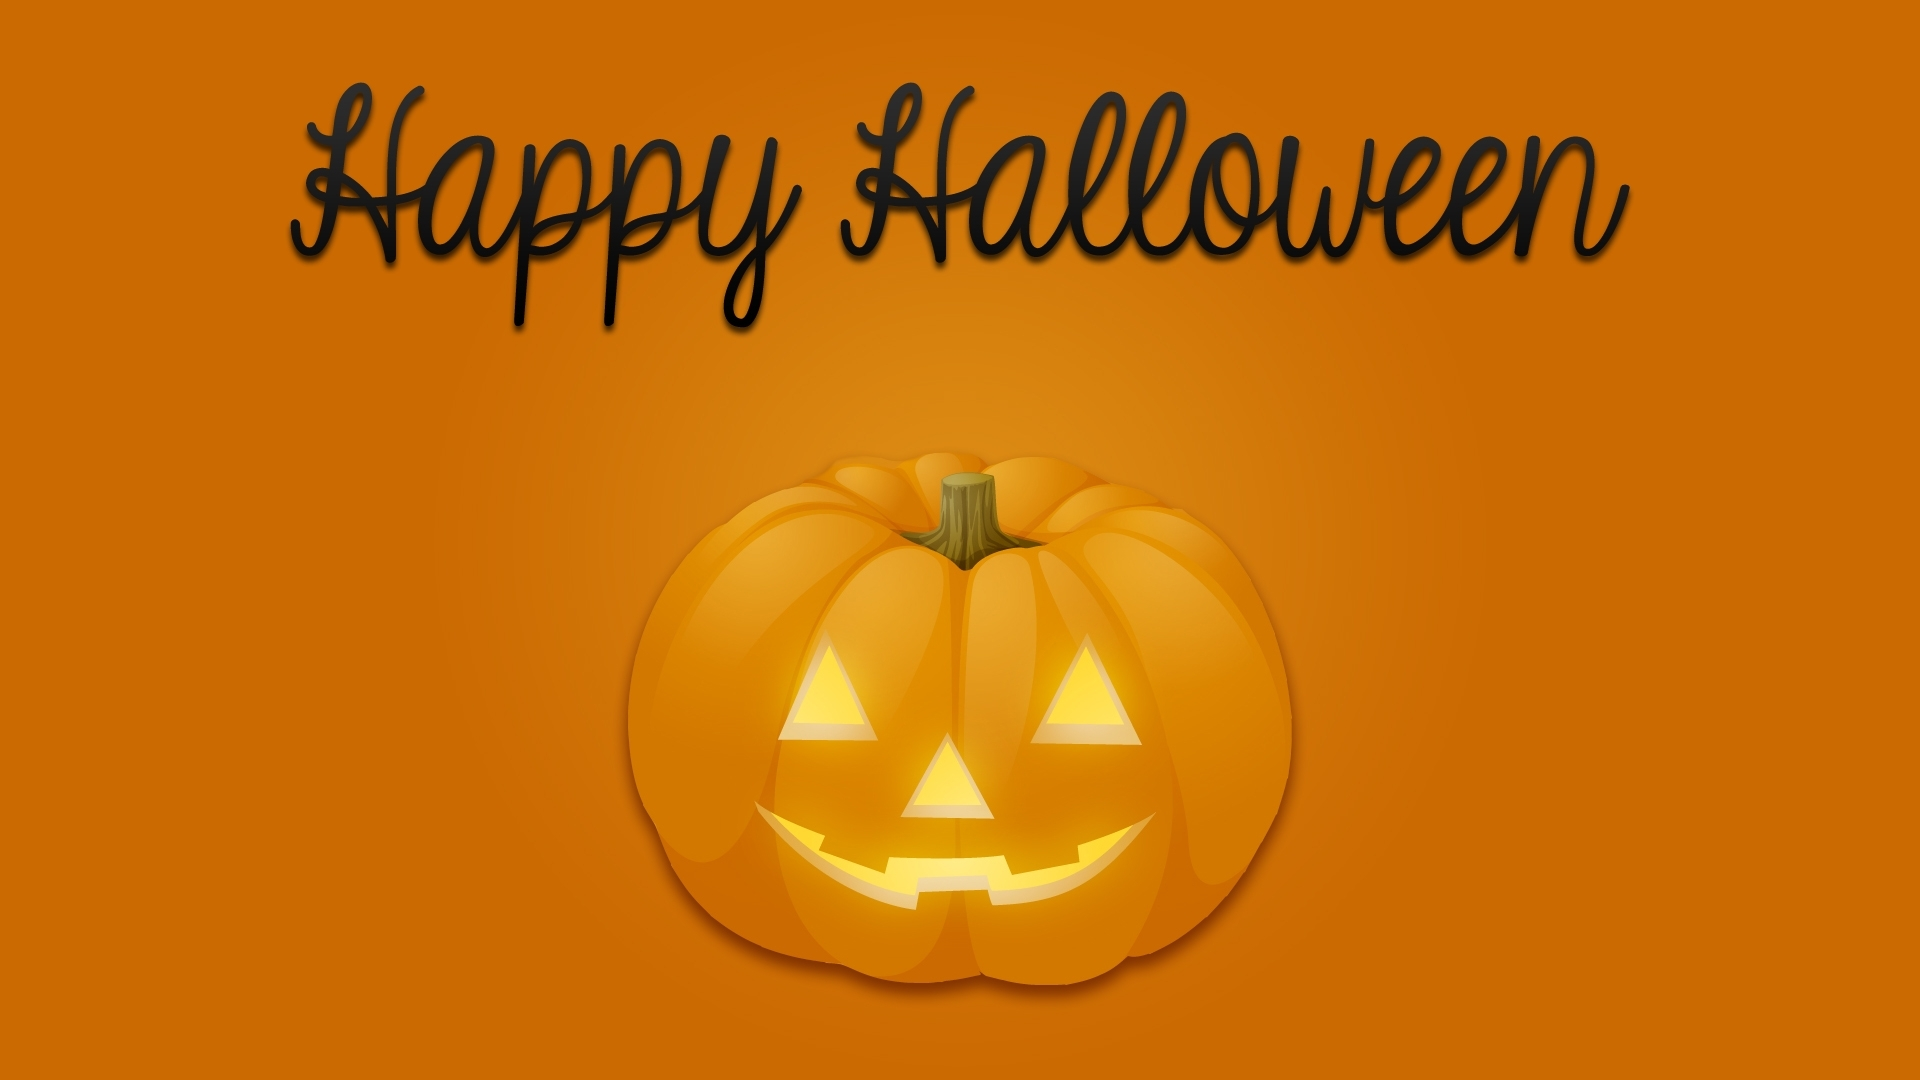 happy halloween pumpkin wallpaper 1920x1080sleepy-stardust on